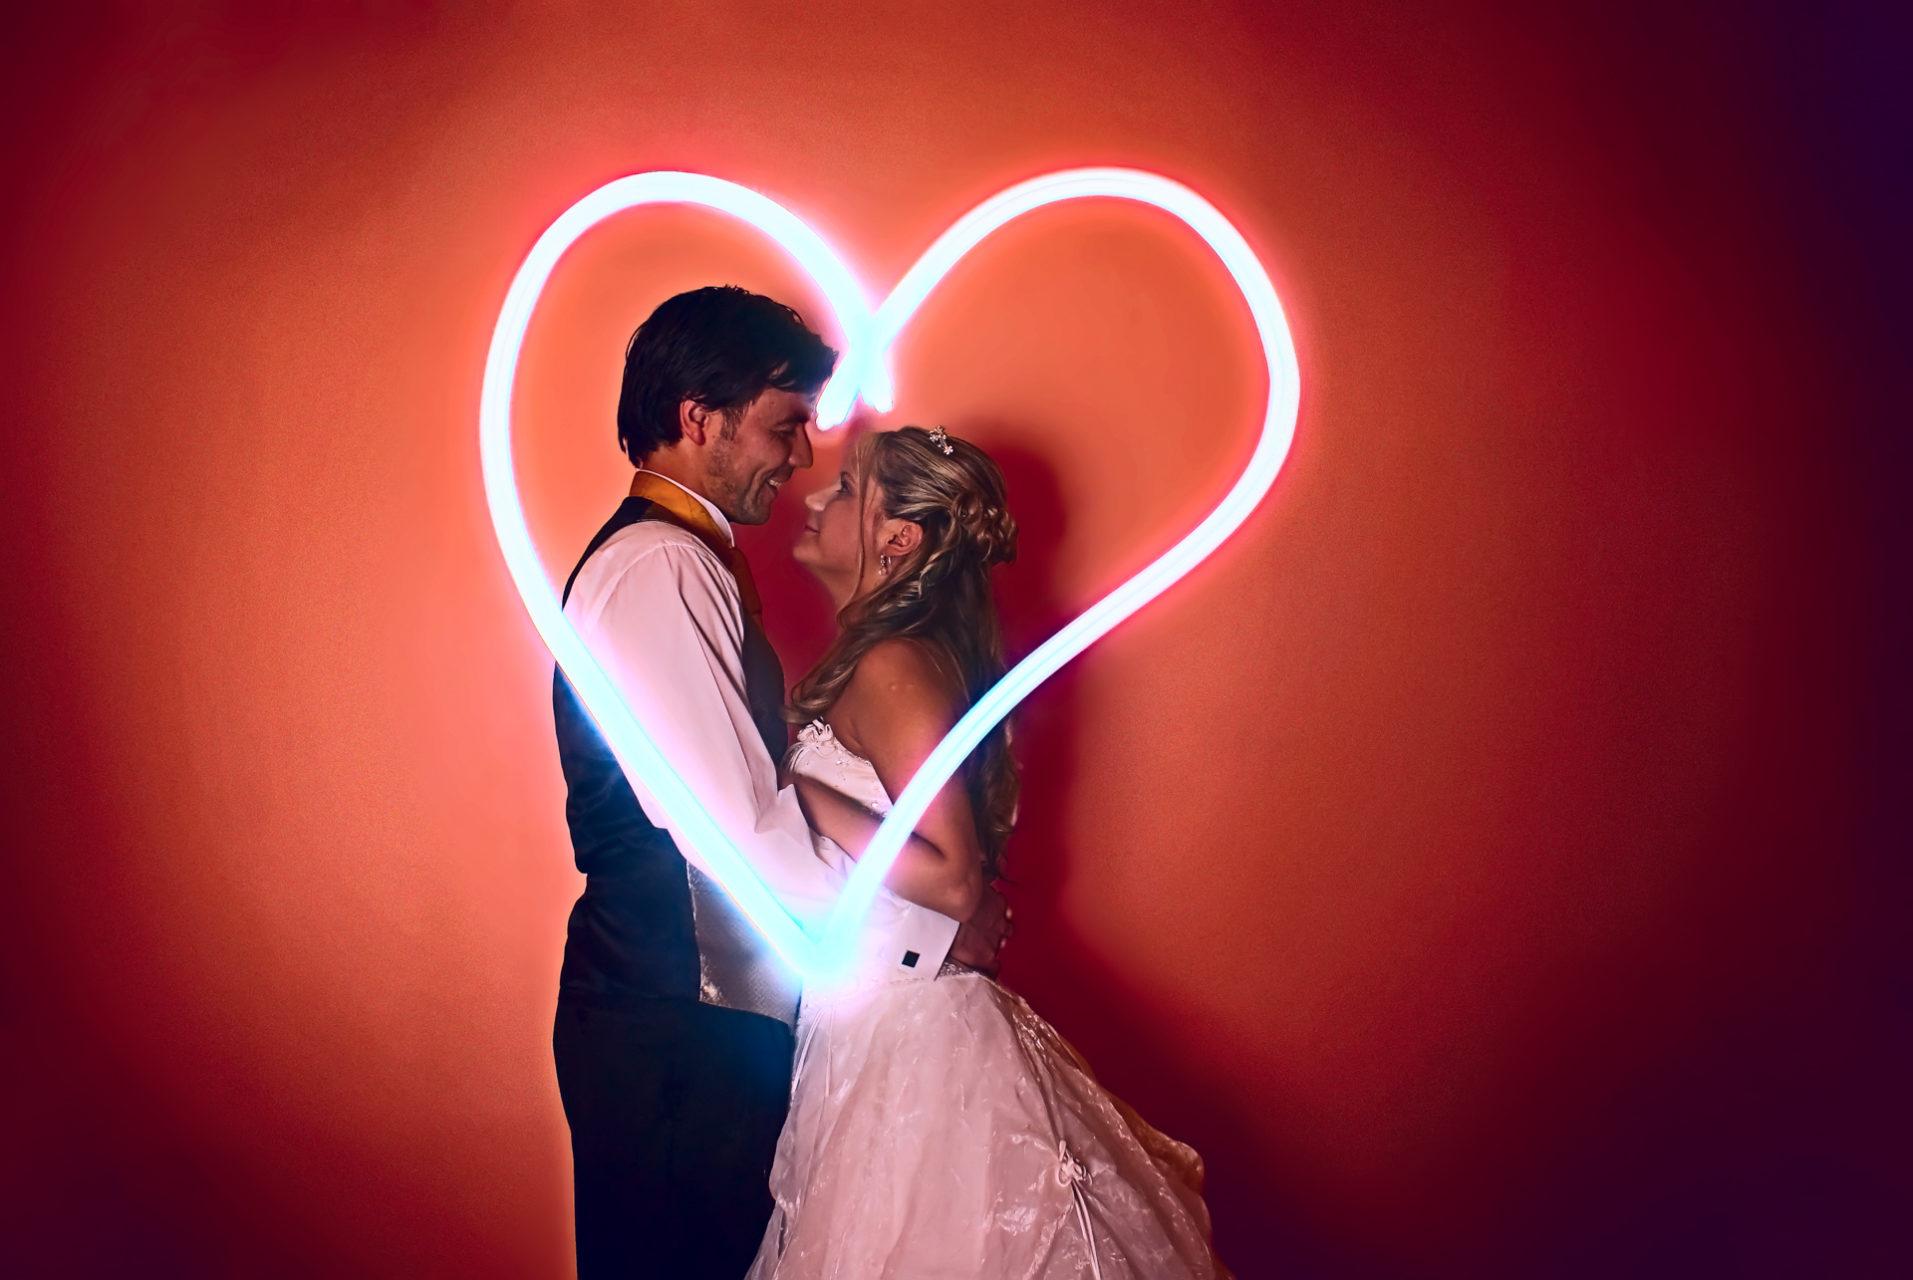 Fotografía Matrimonios - Daniel Caro